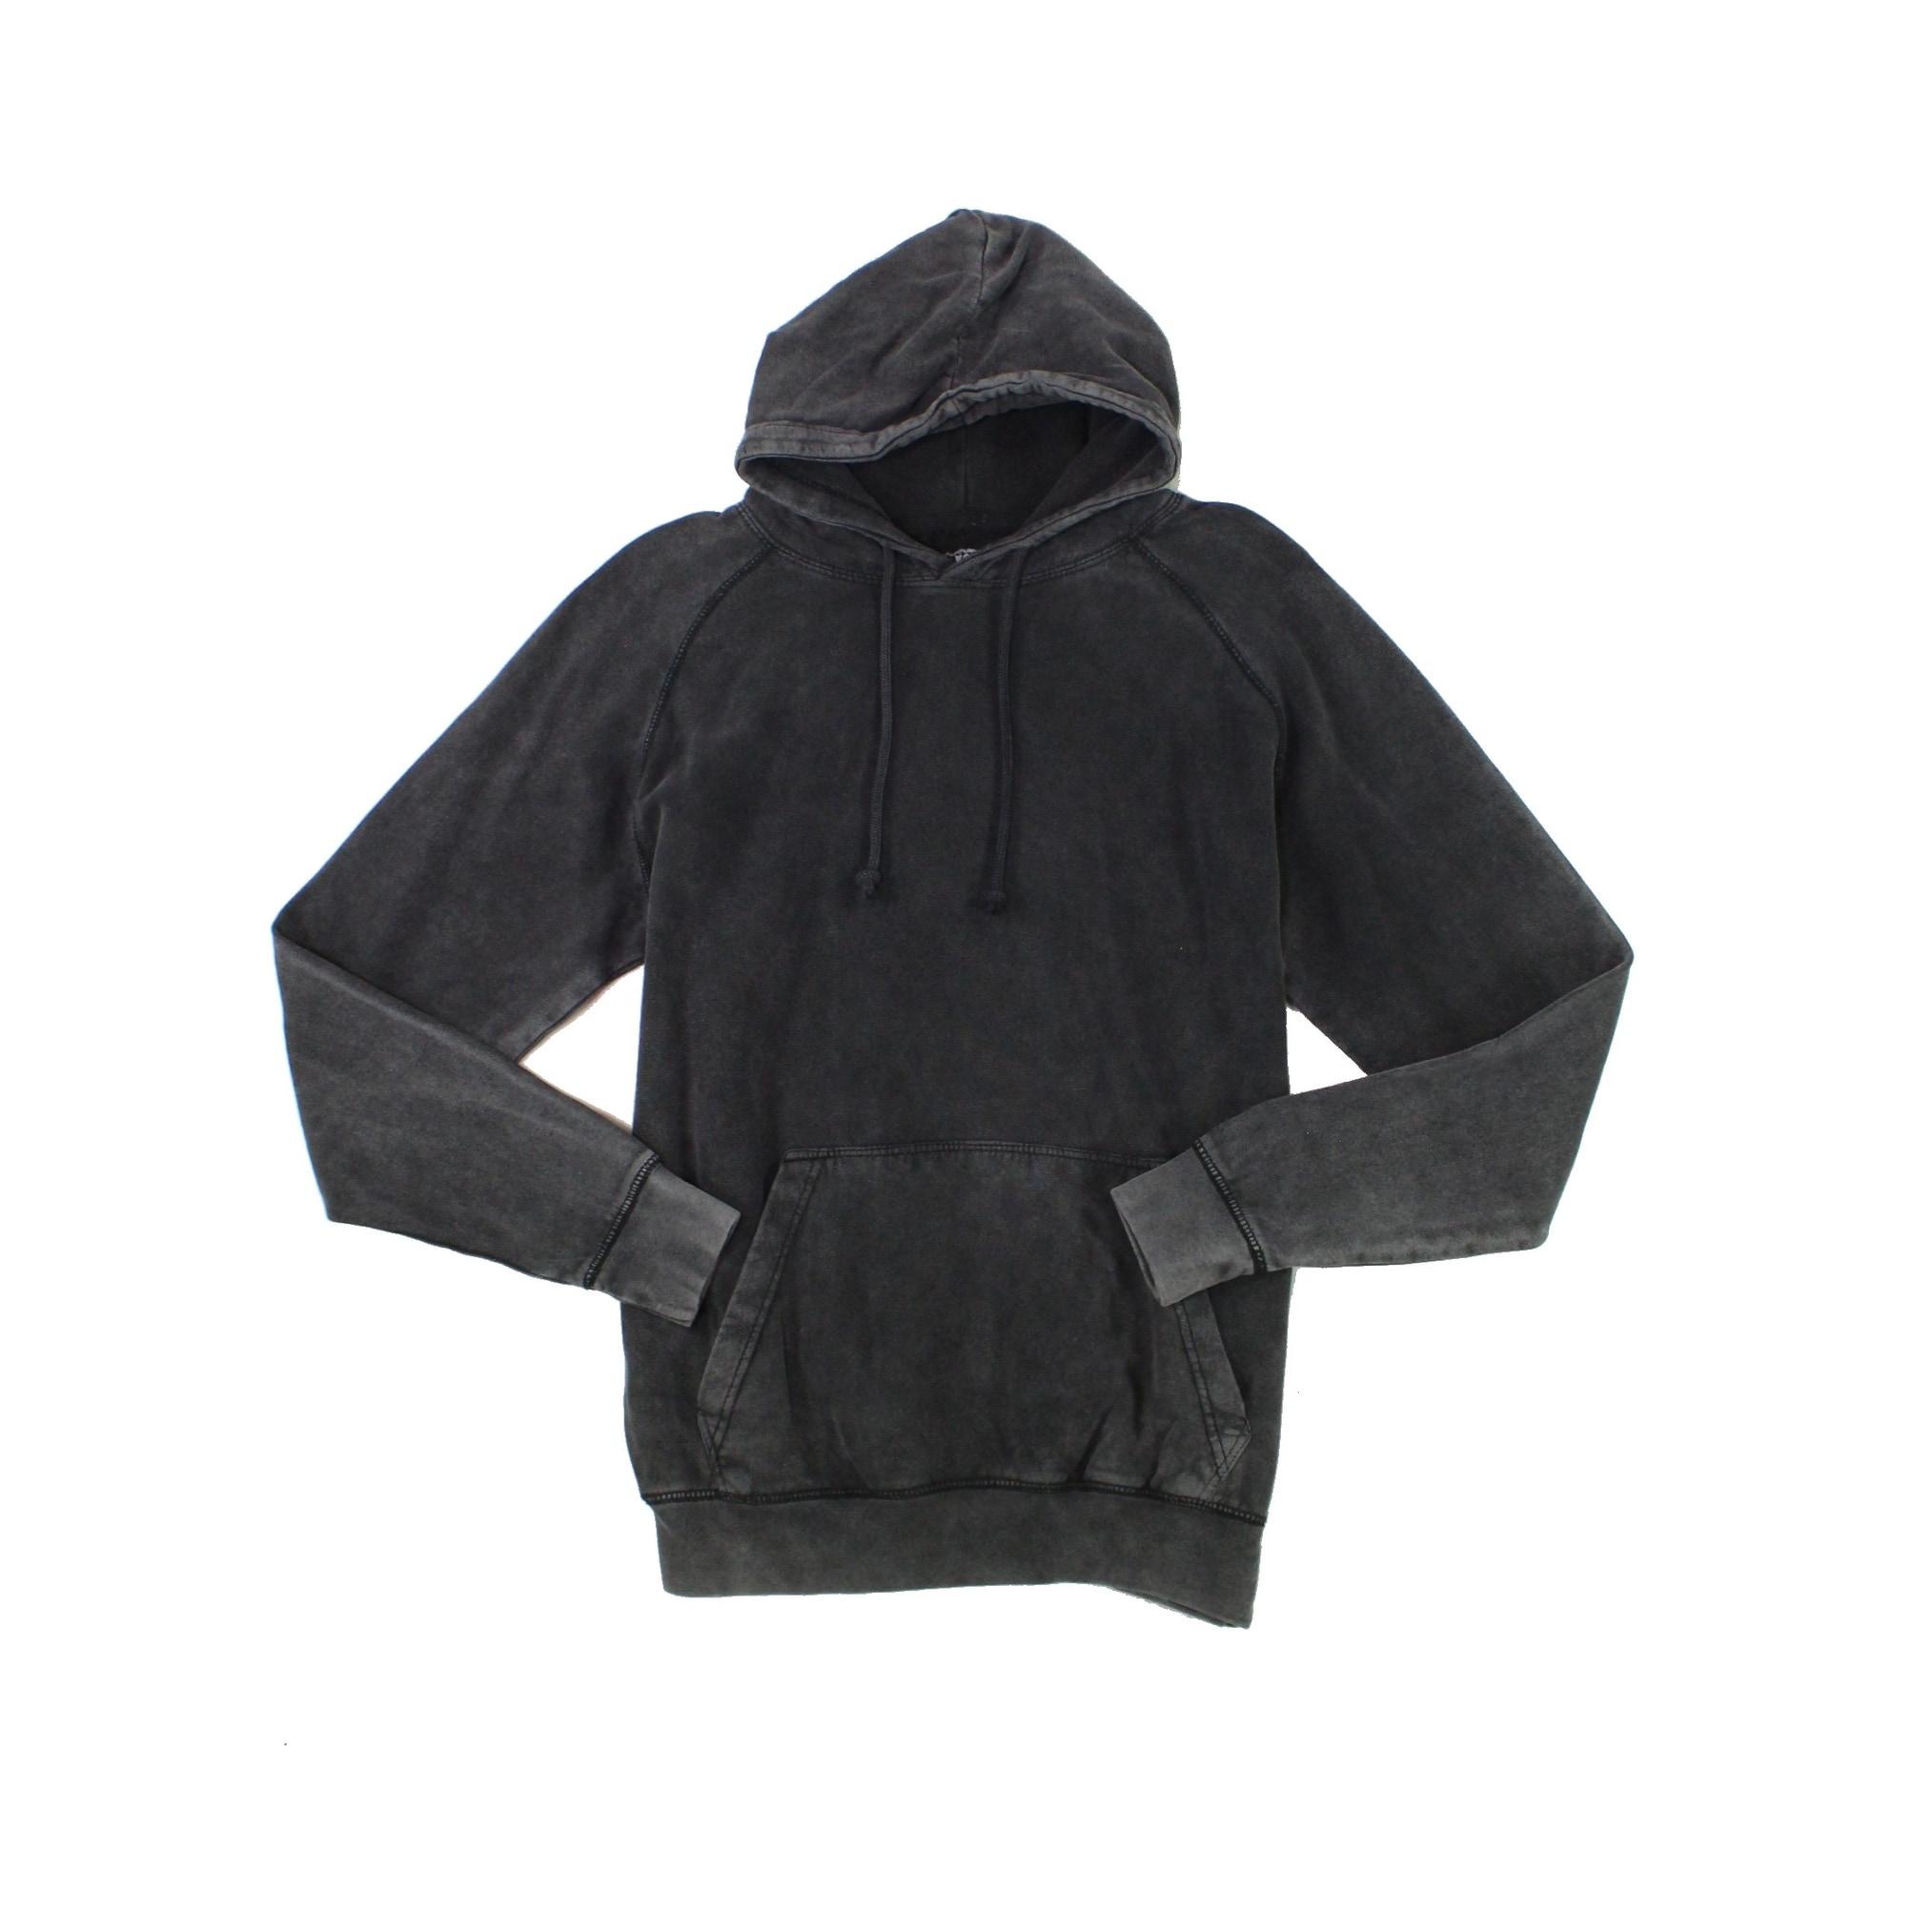 /♥ETHELDING/♥ Cotton-Padded Jackets Women Winter Long Sleeve Outerwear Pocket Fur Hooded Loose Coats